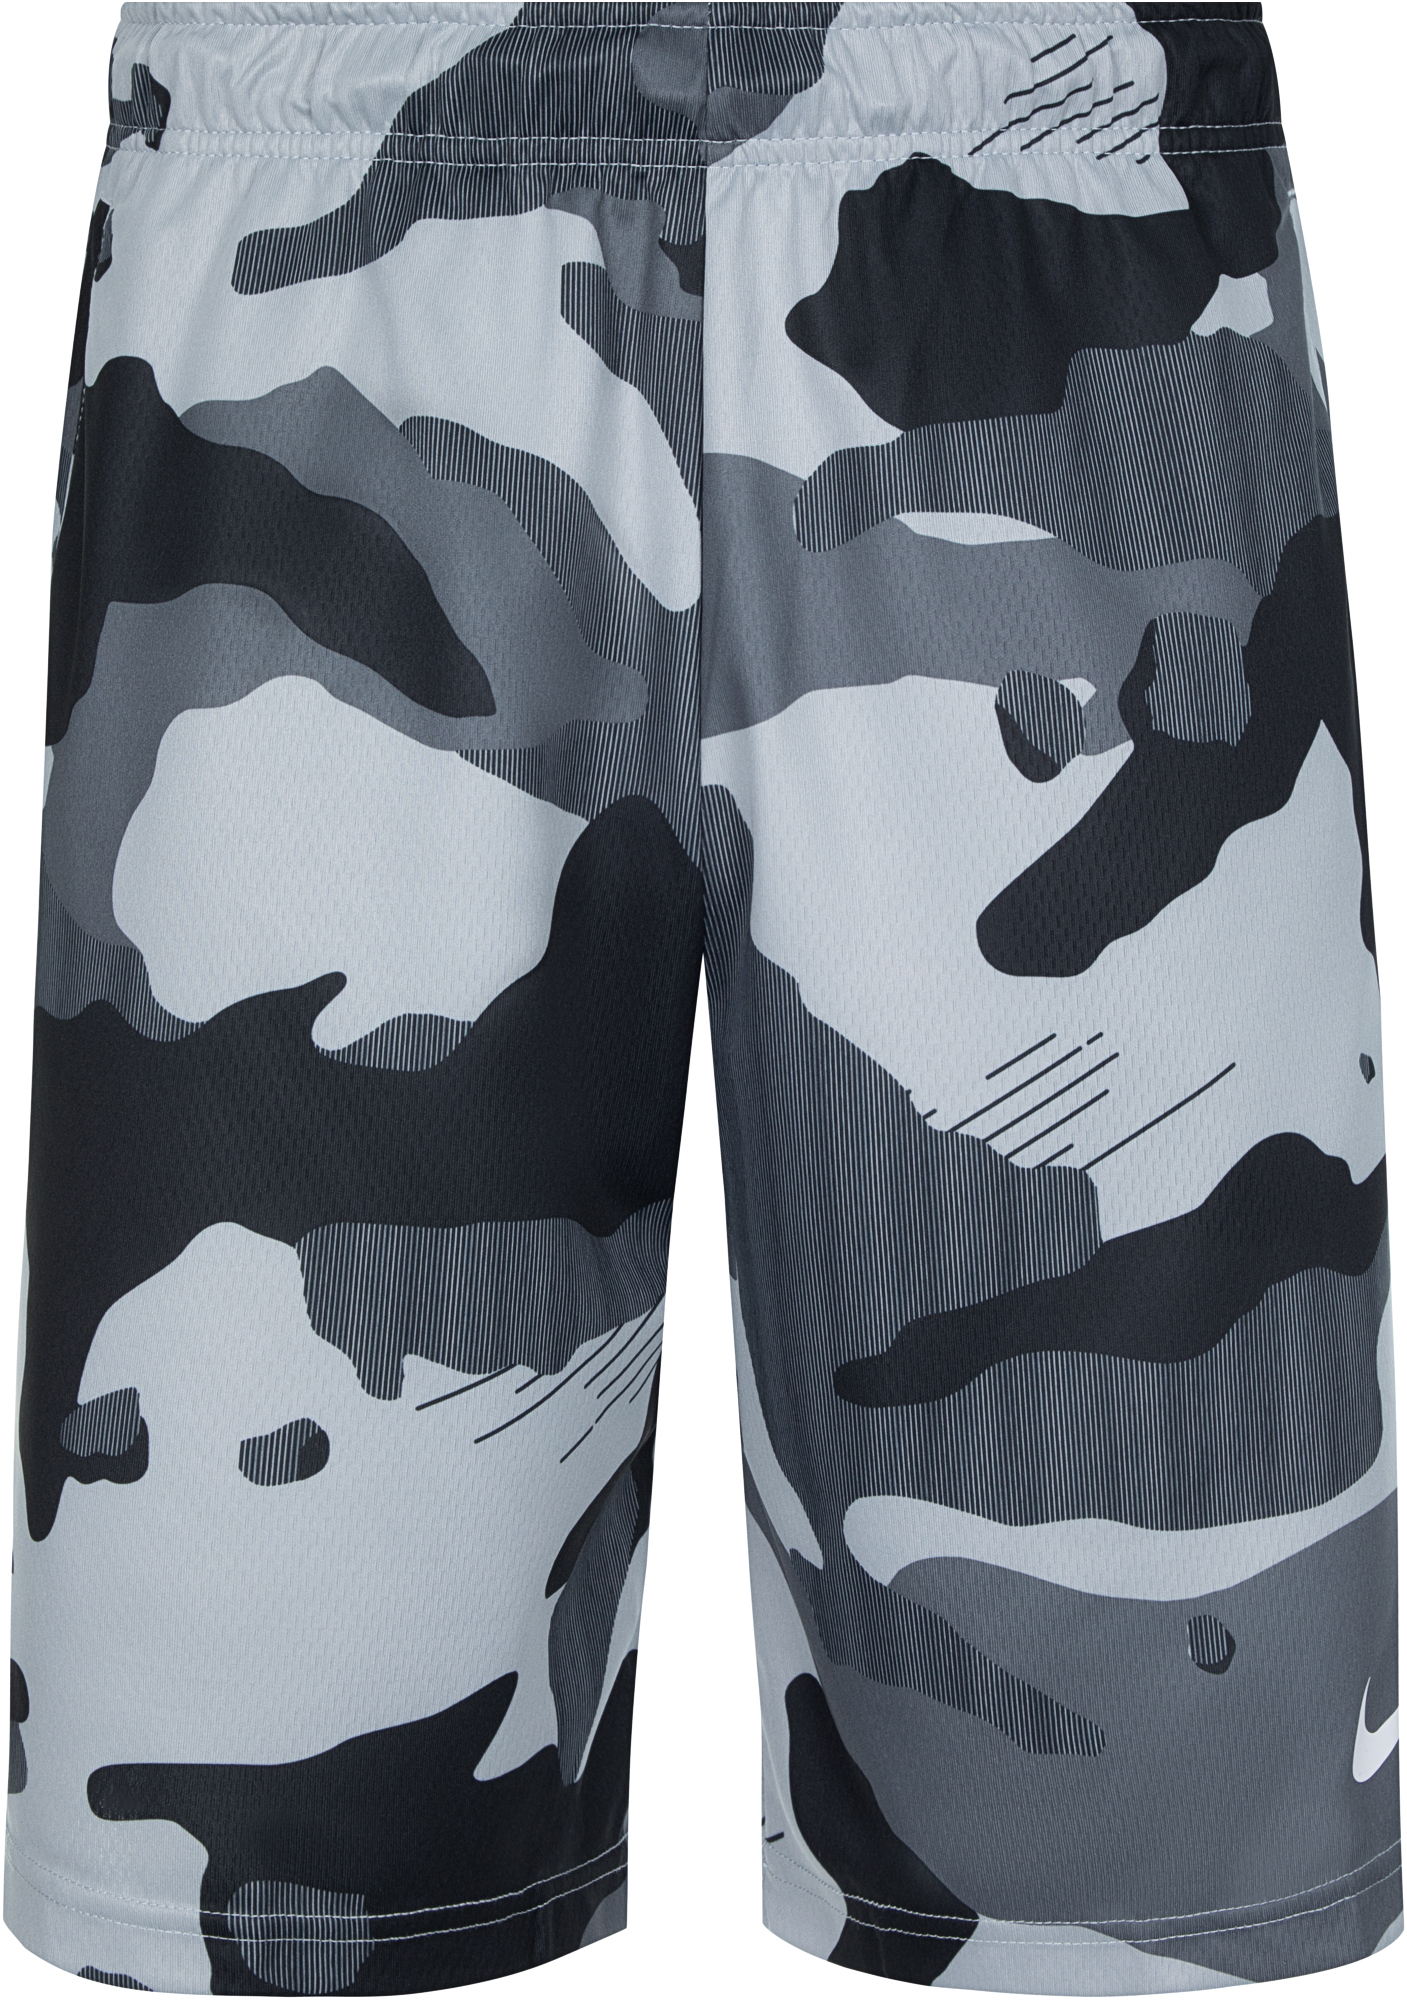 Nike Шорты мужские Dry, размер 54-56